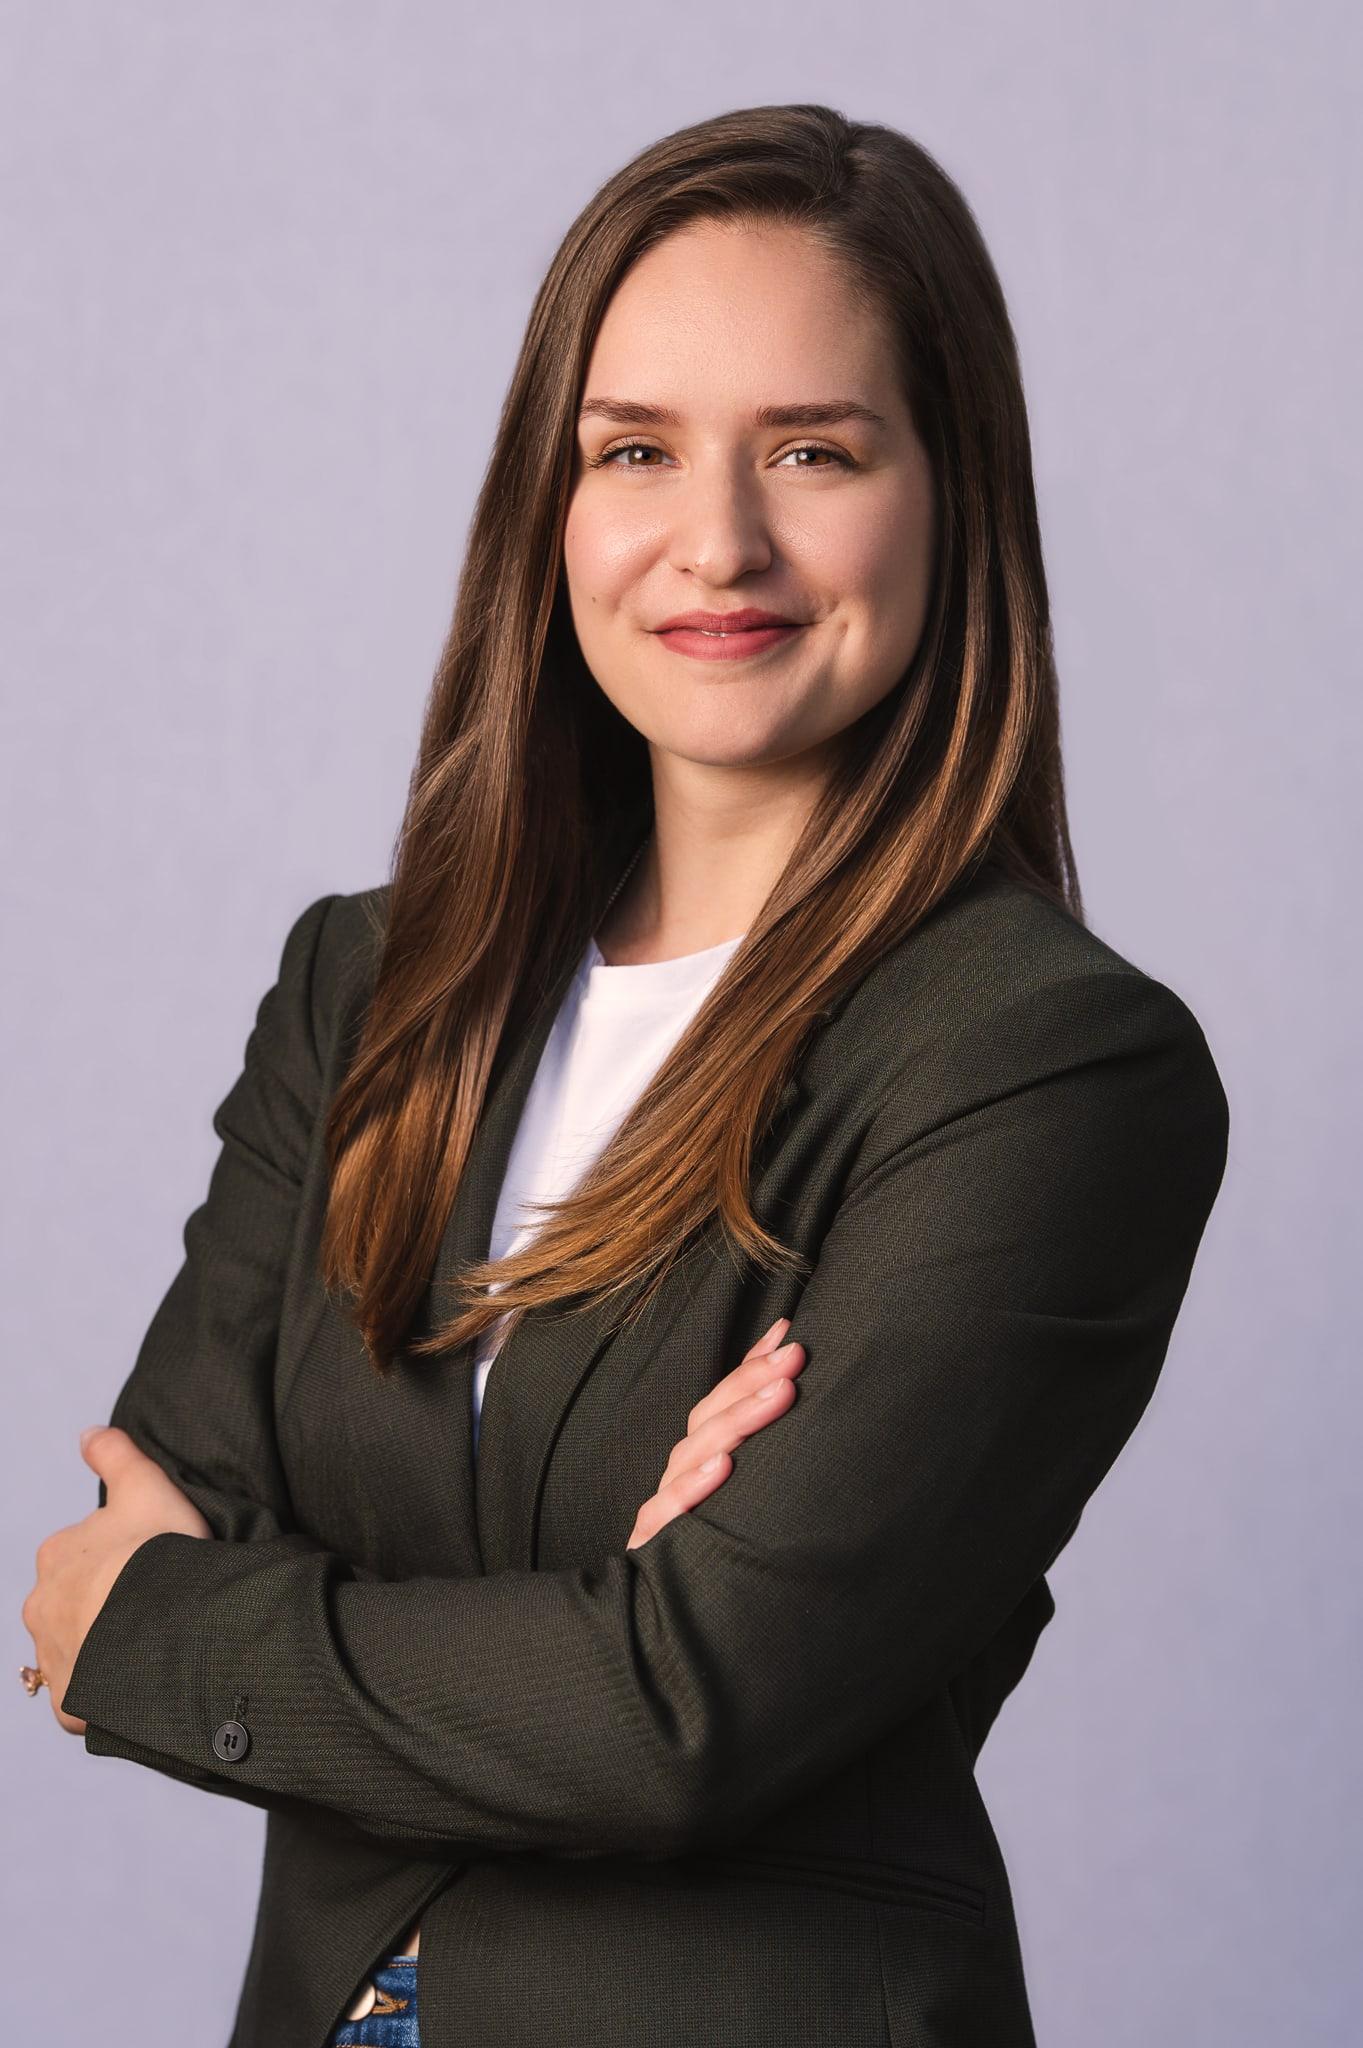 Headshot of young, female professional.